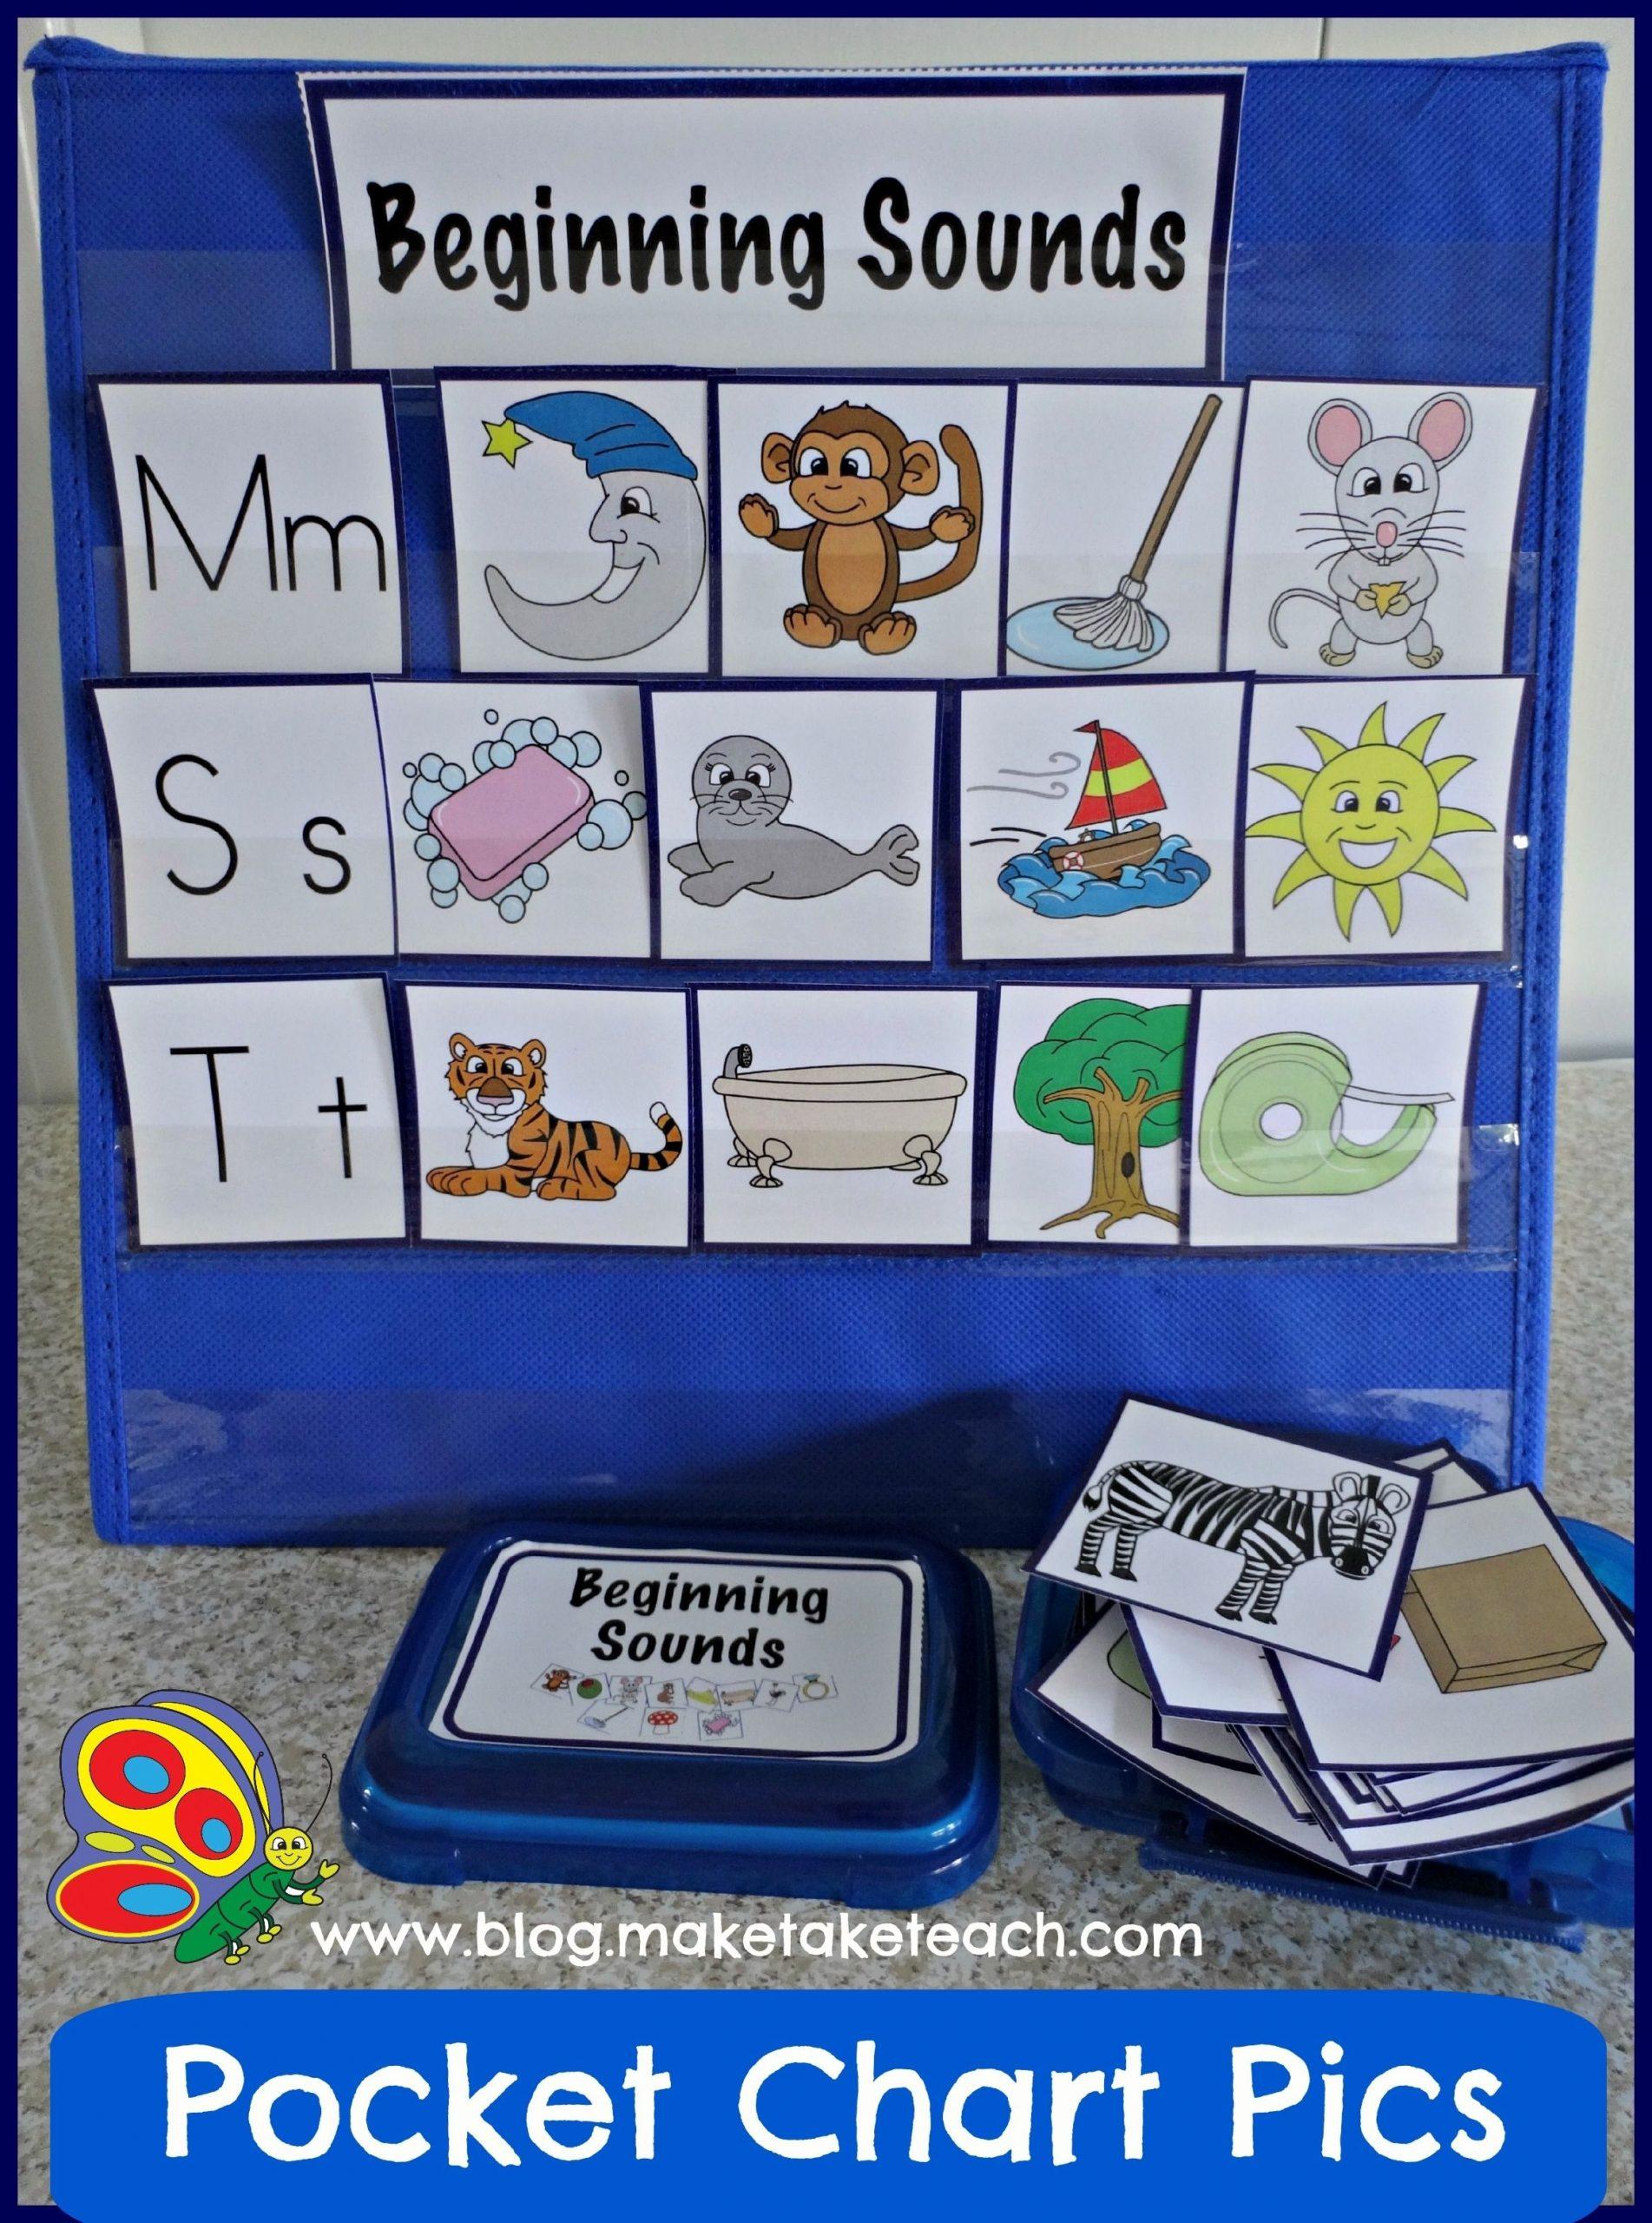 Pocket Chart Pictures - Make Take & Teach | Alphabet